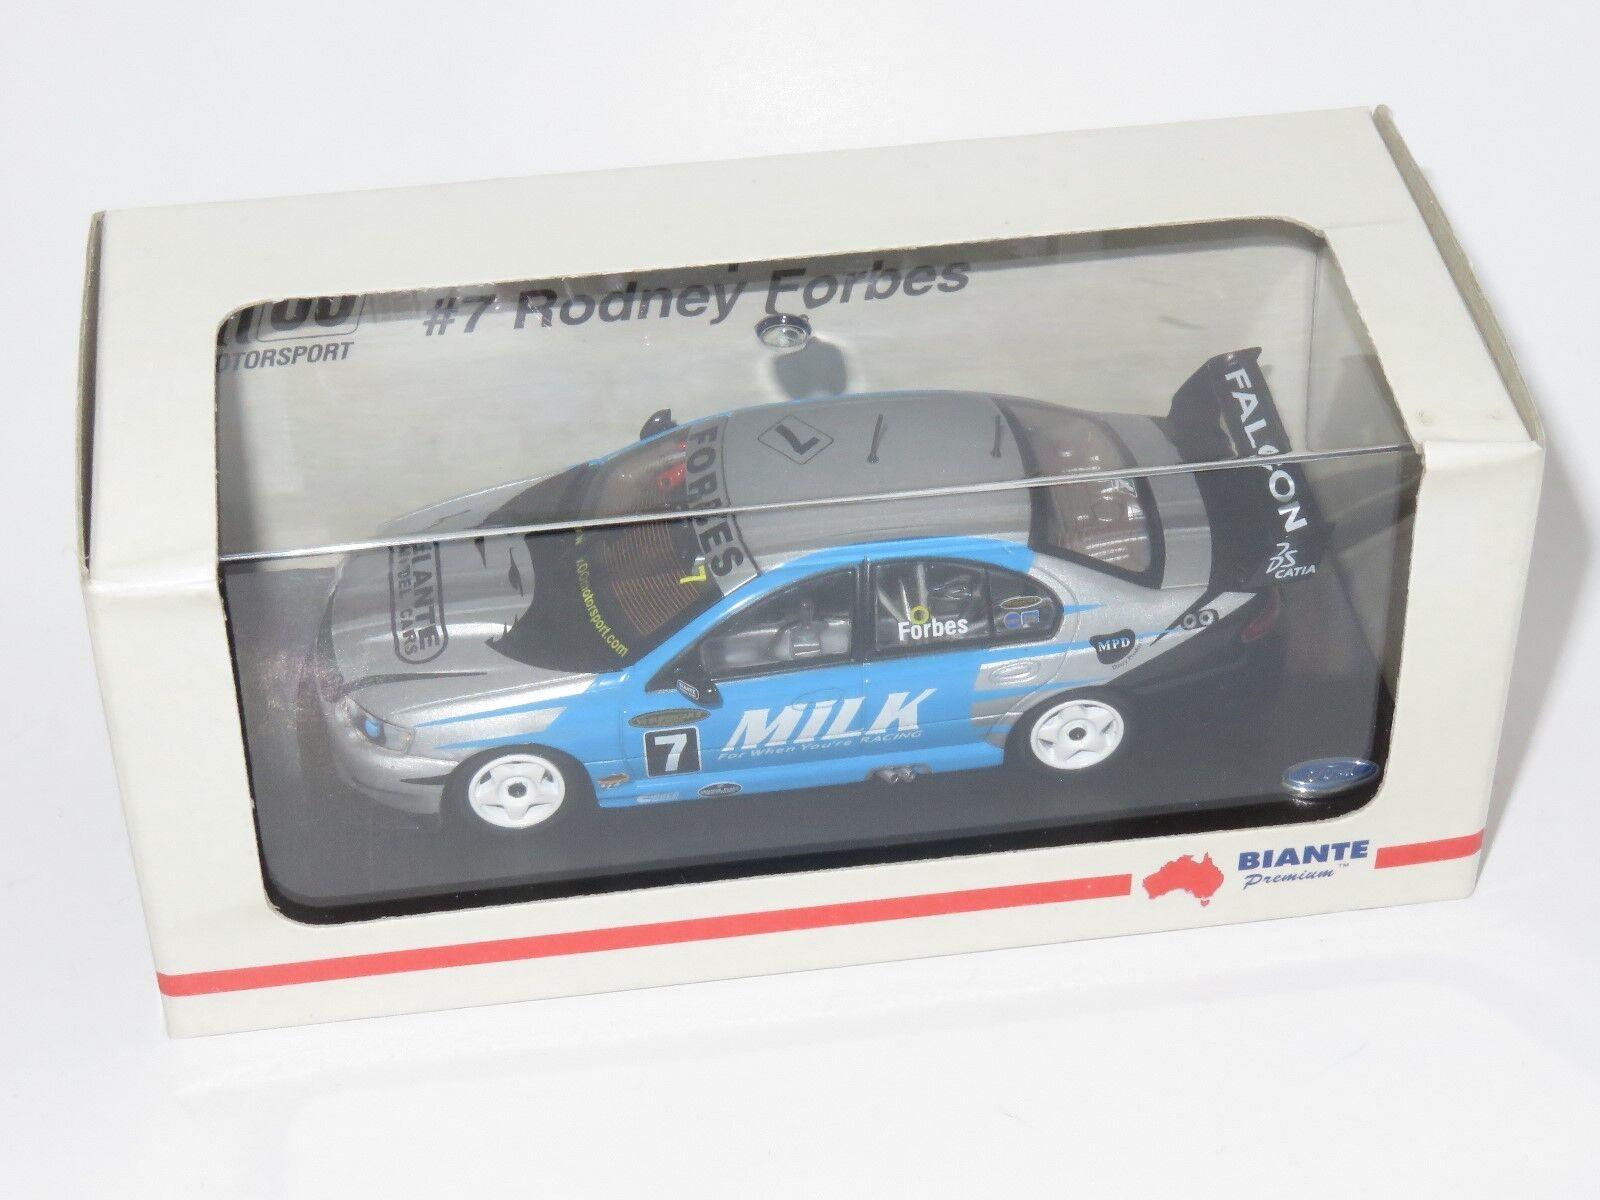 1/43 FORD BA Falcon XR8 00 Motorsport 2003 Australiano V8 SUPERCAR Rodney Forbes